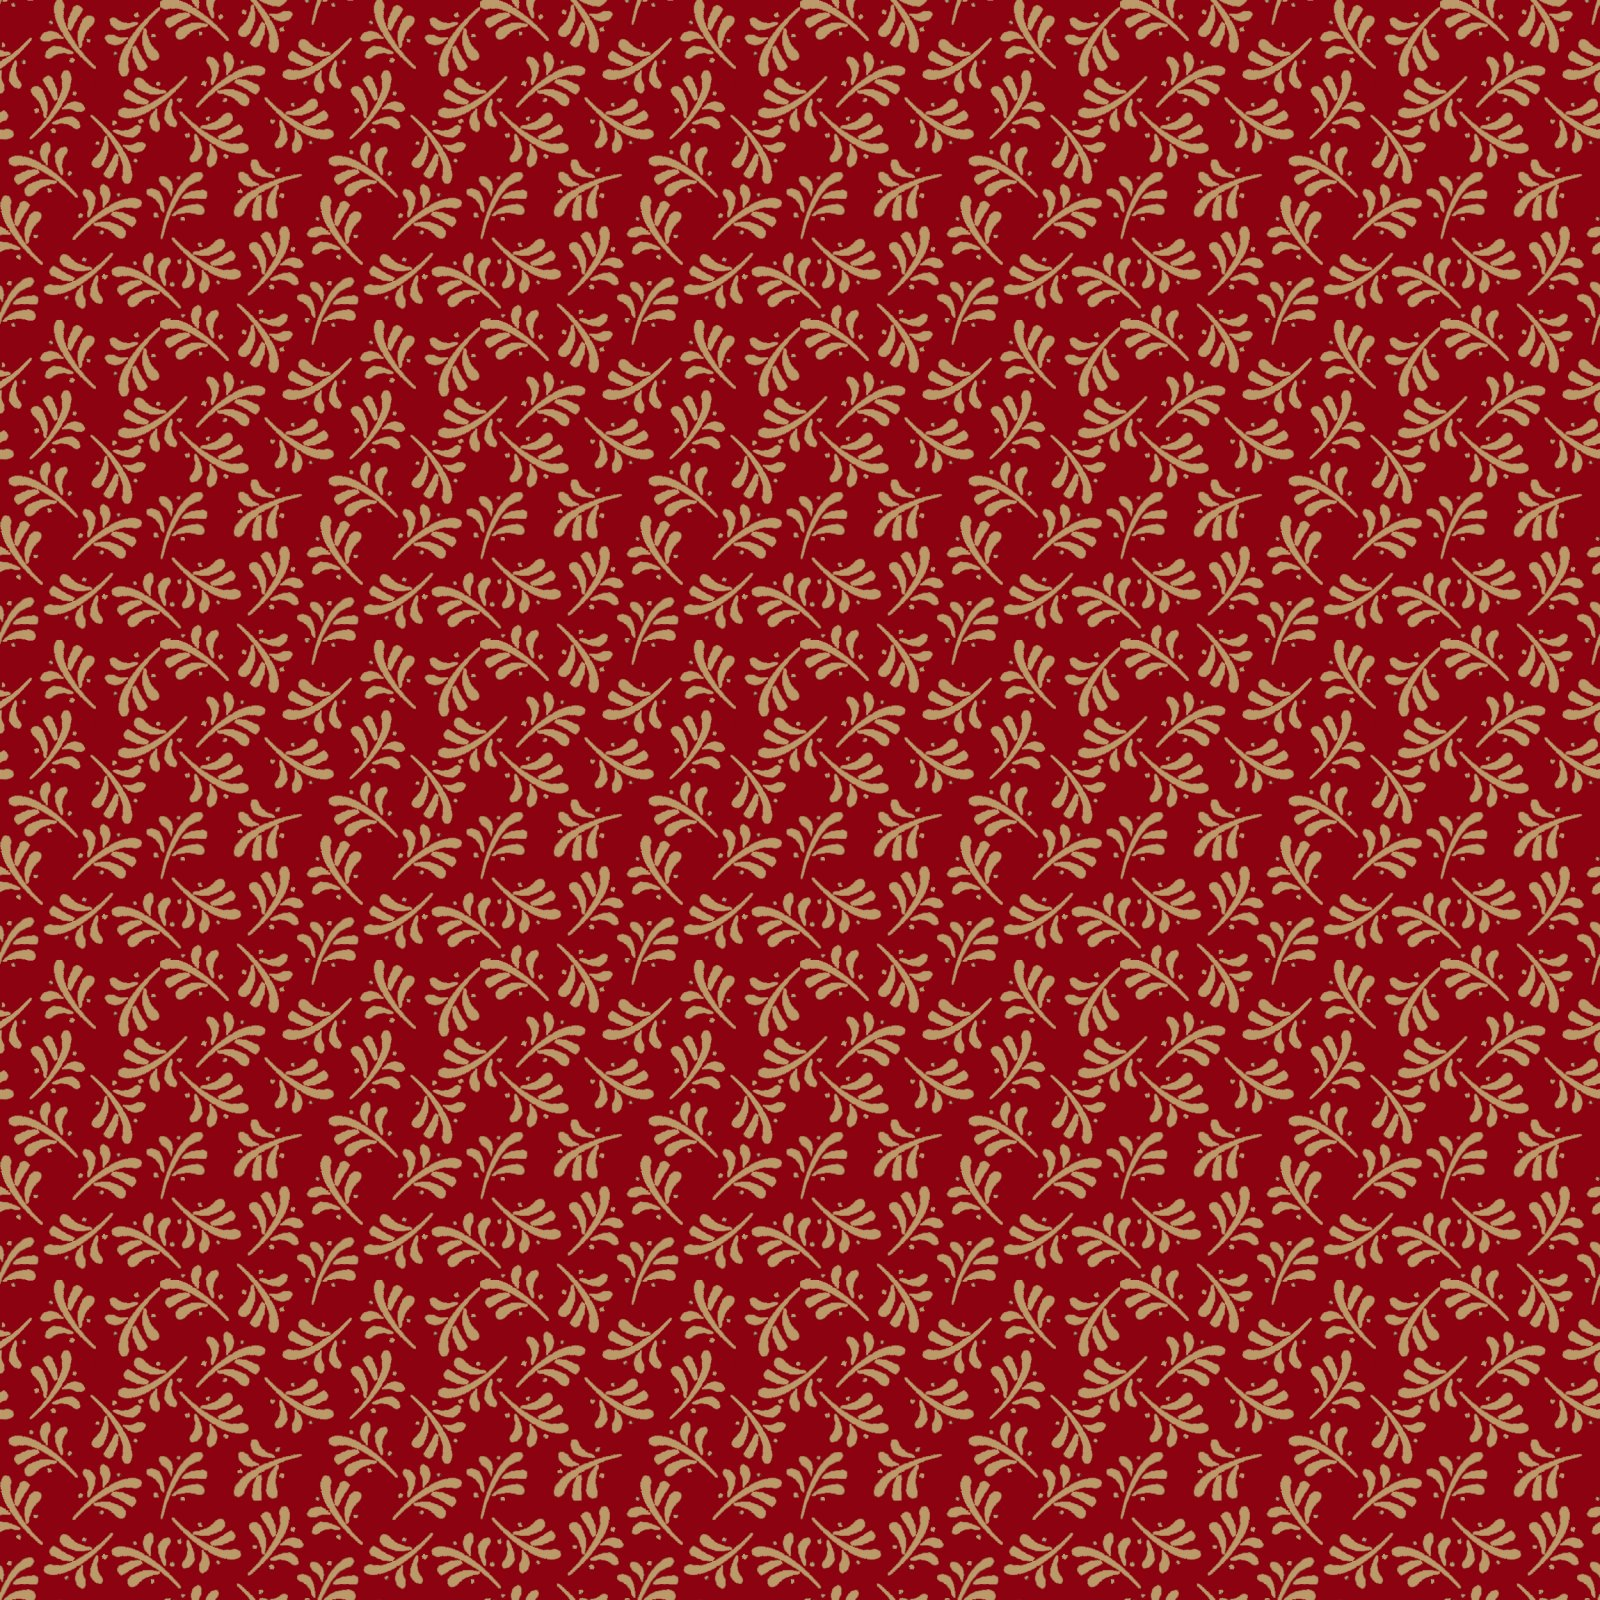 Funky Fern Ruby Red FQ<br/>EQP 1805-01